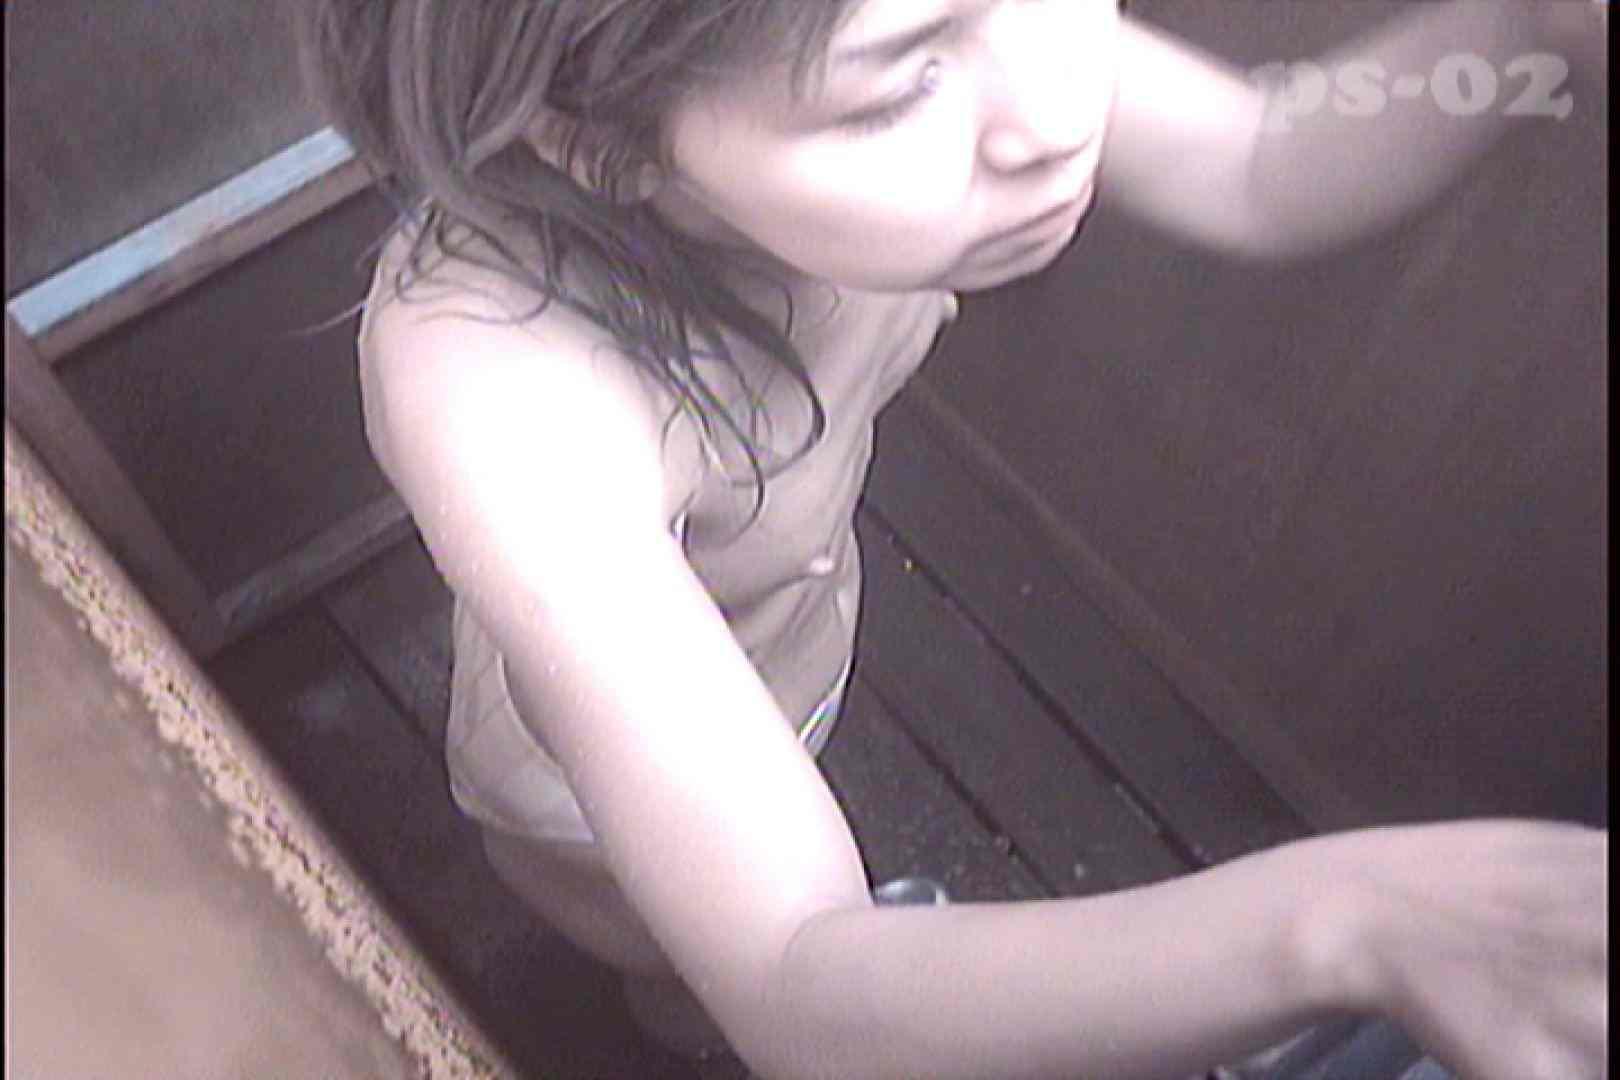 File.09 貧乳そして大きな乳首のお女市さん 盗撮  102PIX 55